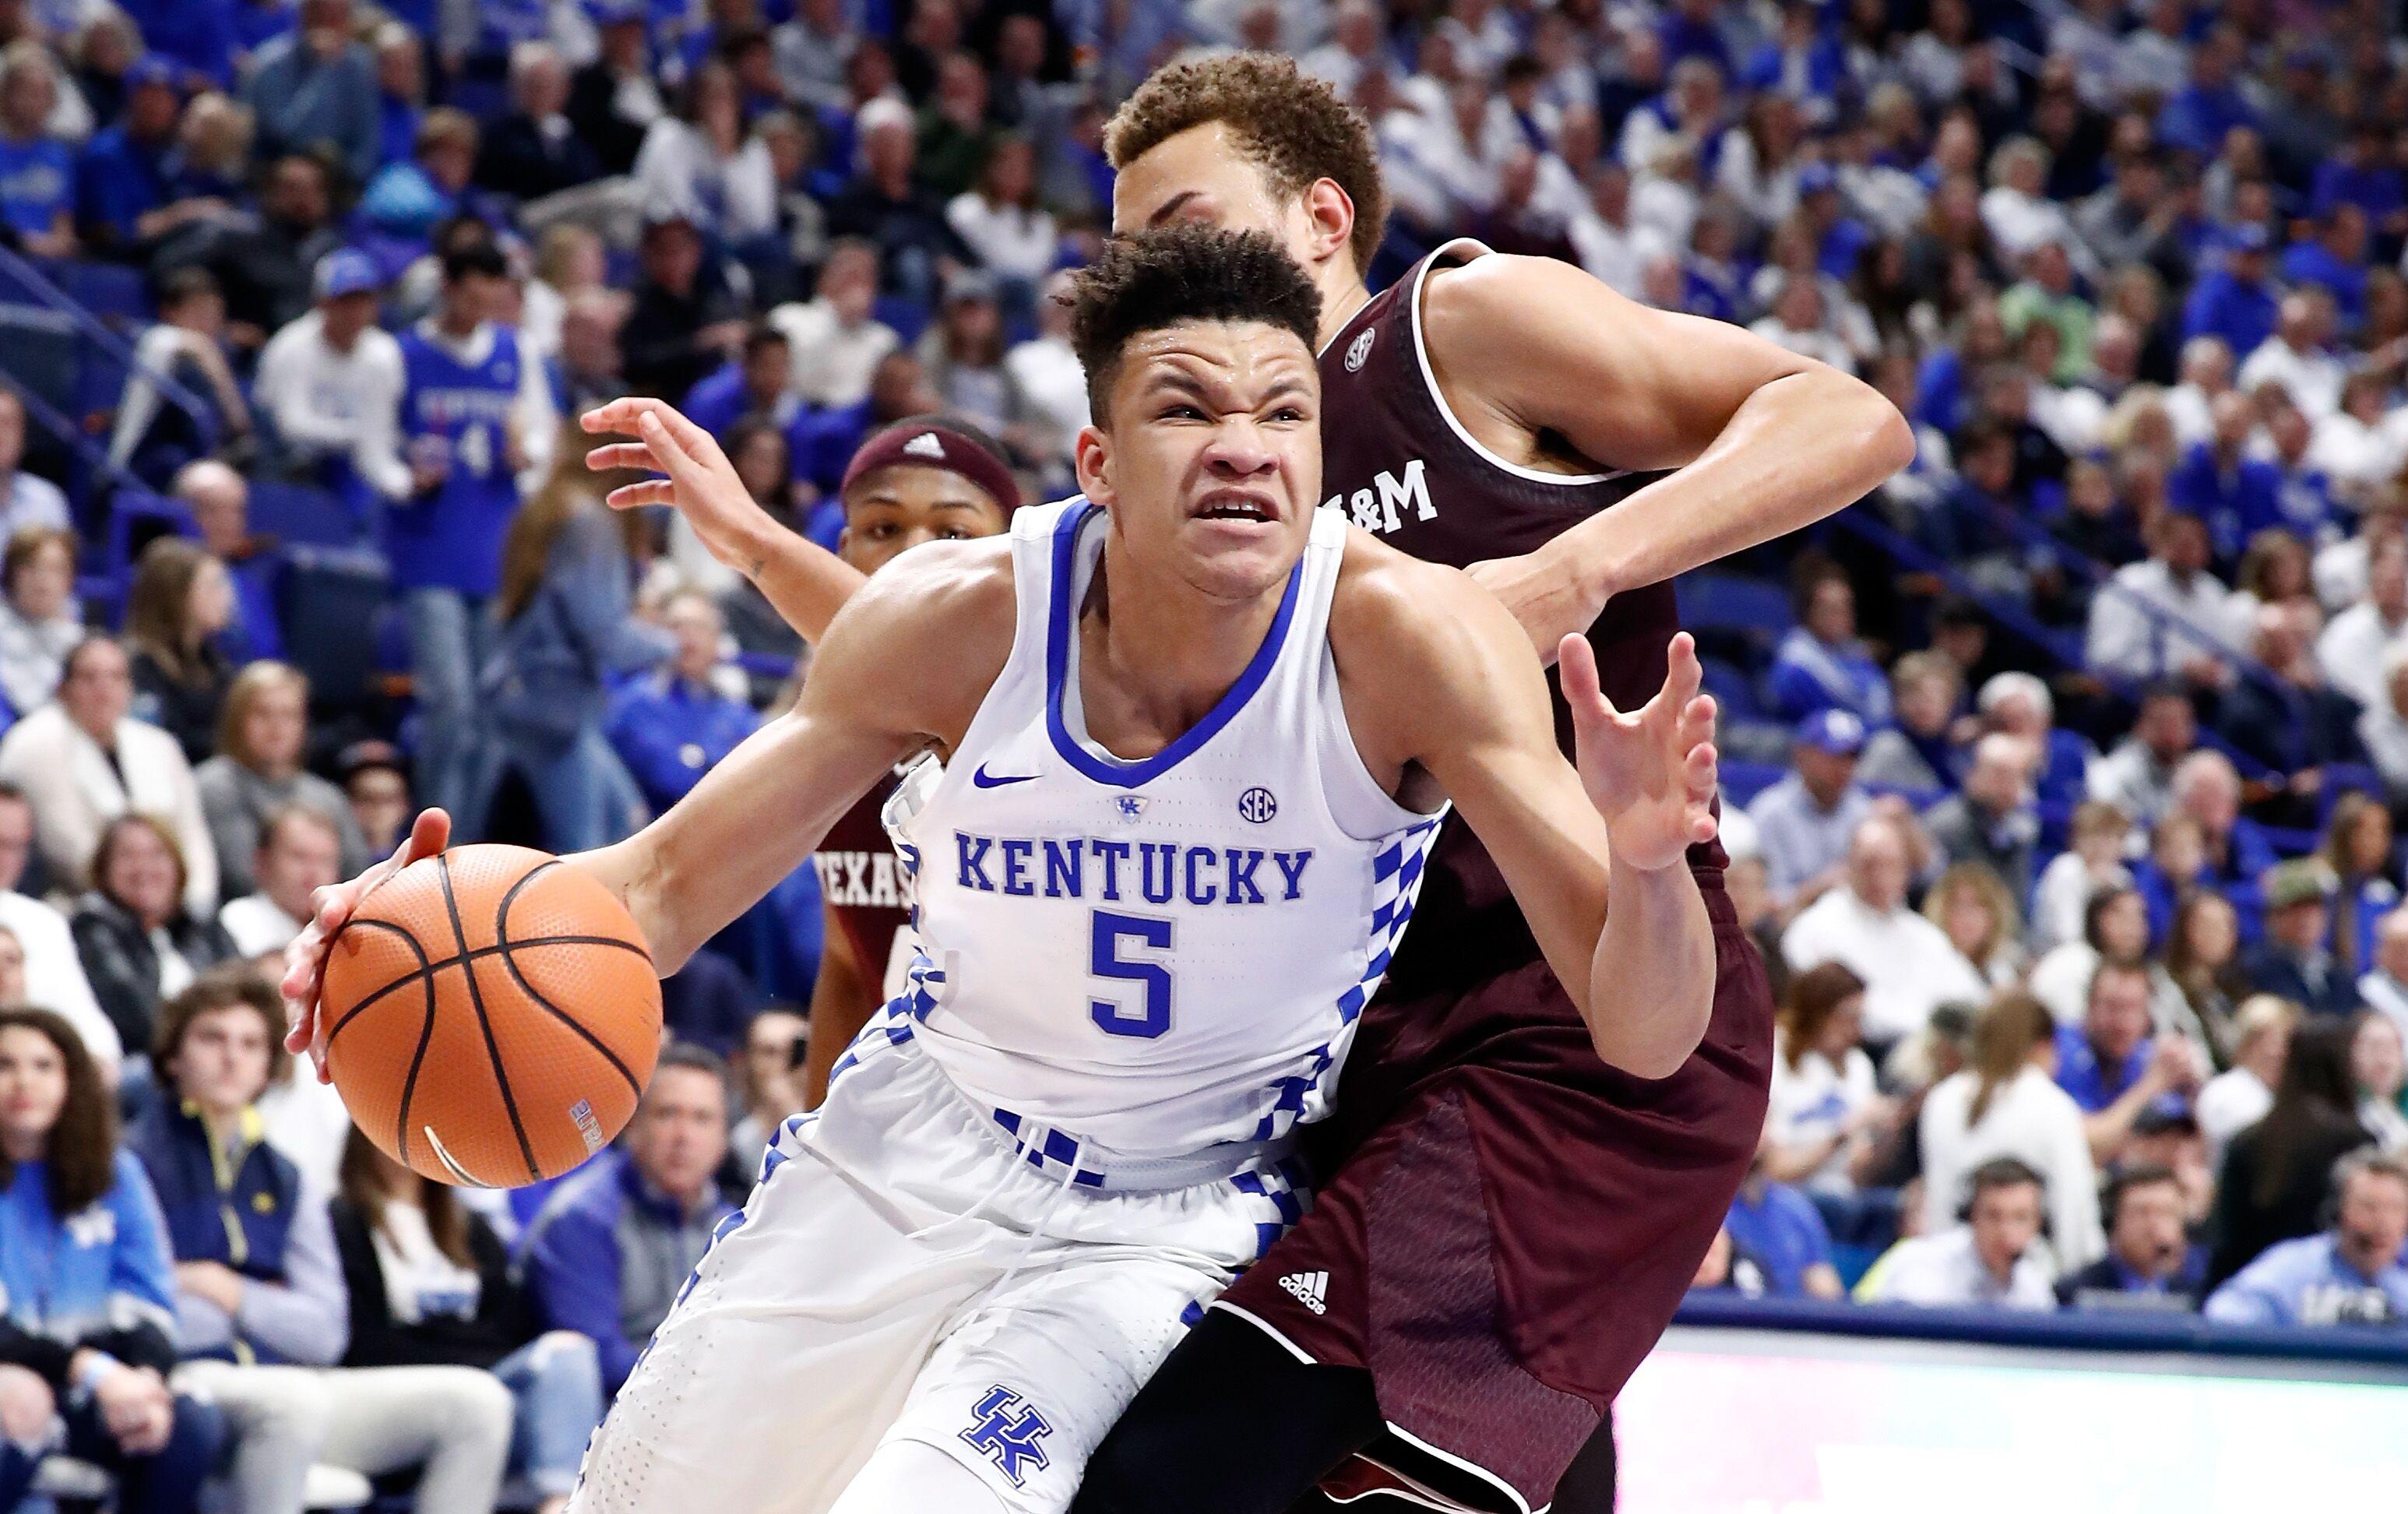 Uk Basketball: Kentucky Basketball: 3 Keys Vs South Carolina, Prediction